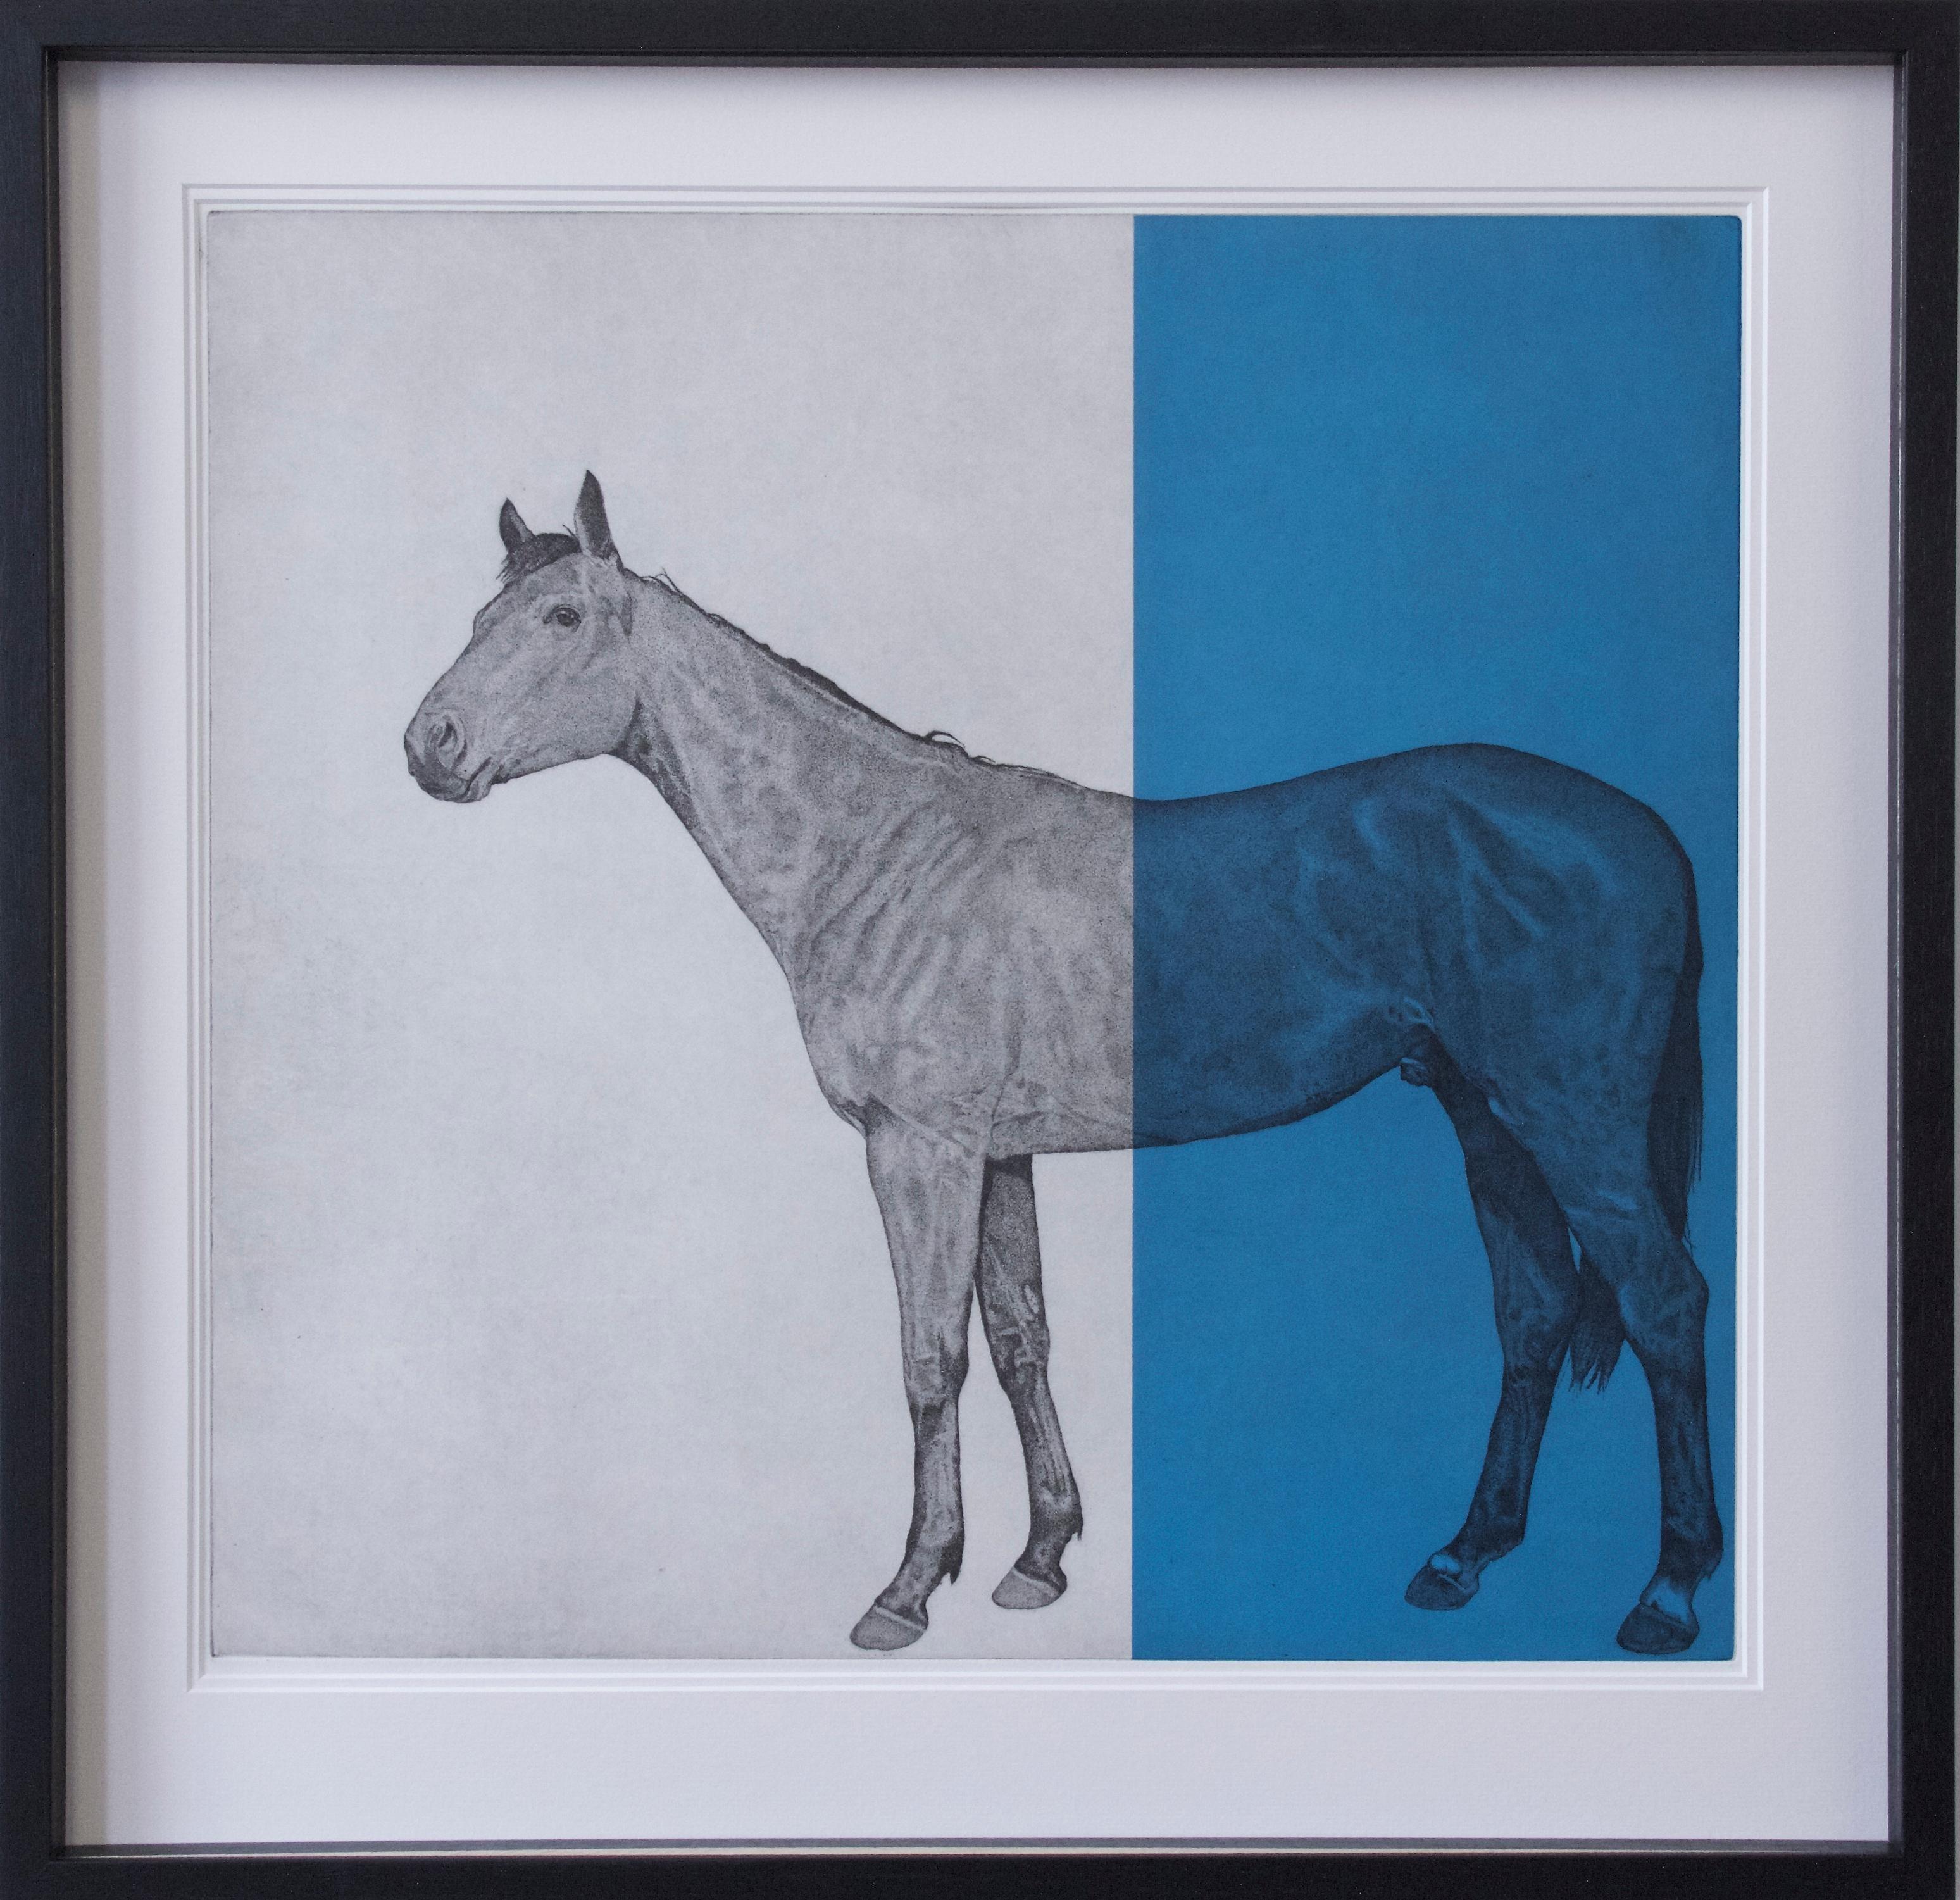 Guy Allen, Horse Study Blue, Bright Art, Etching Print, Contemporary Equine Art